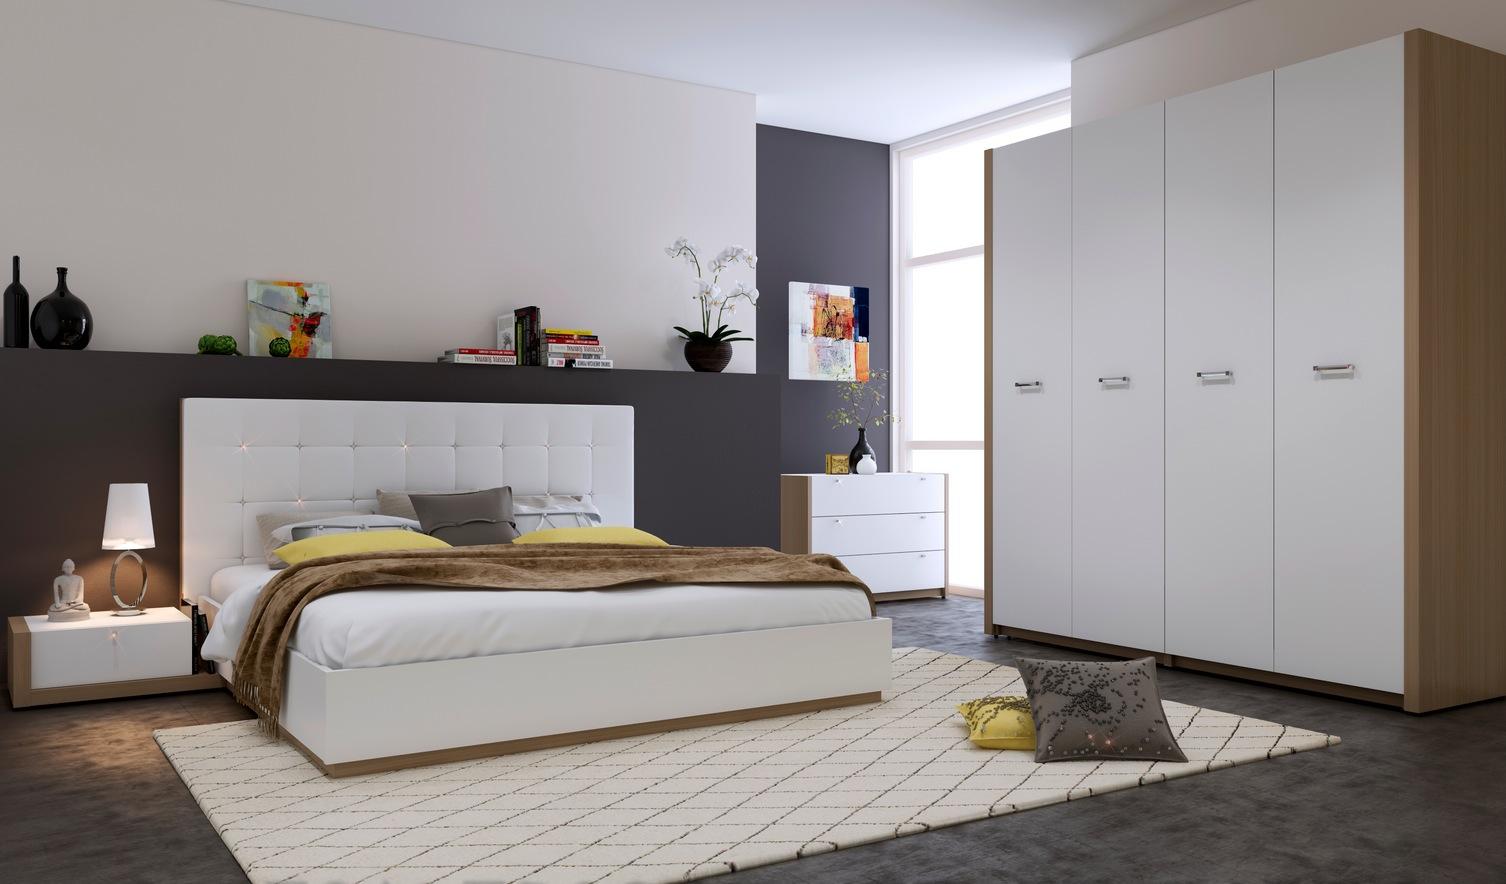 تصاميم دواليب ملابس أنيقة لـ غرف نوم مودرن